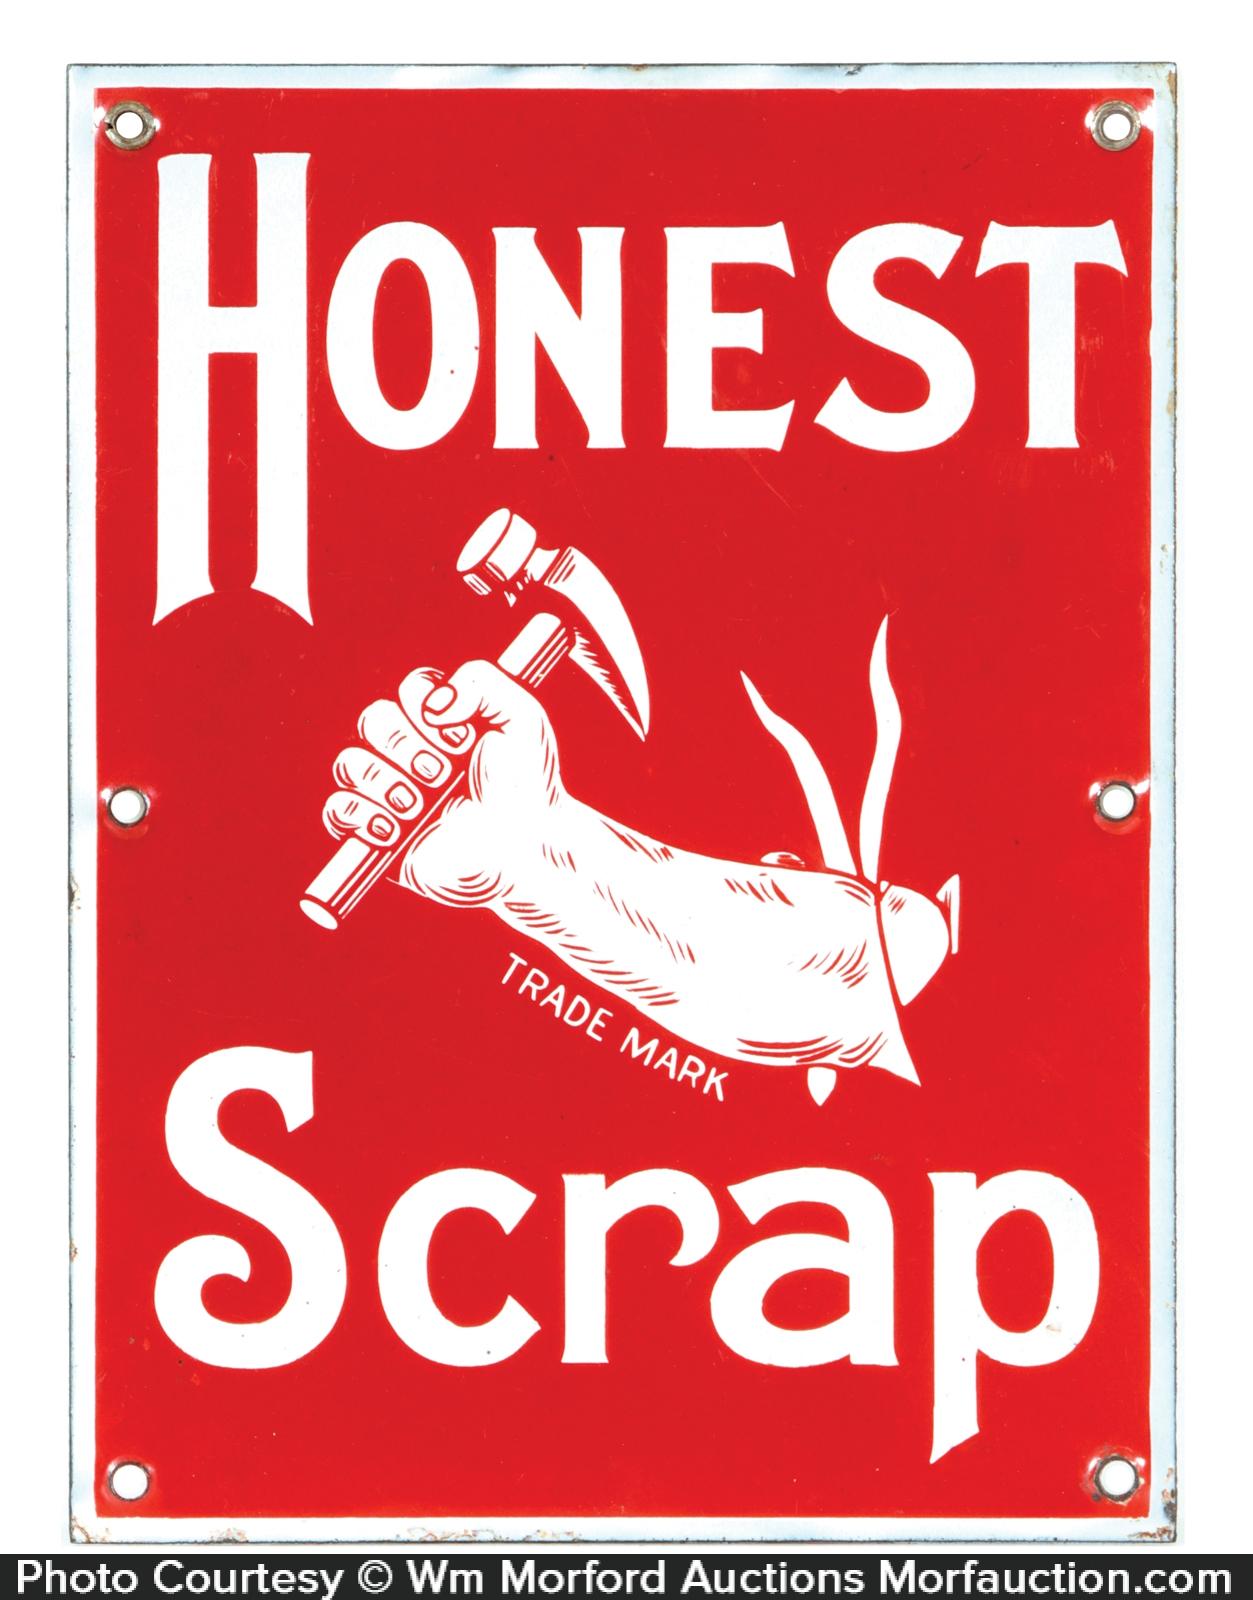 Honest Scrap Porcelain Sign